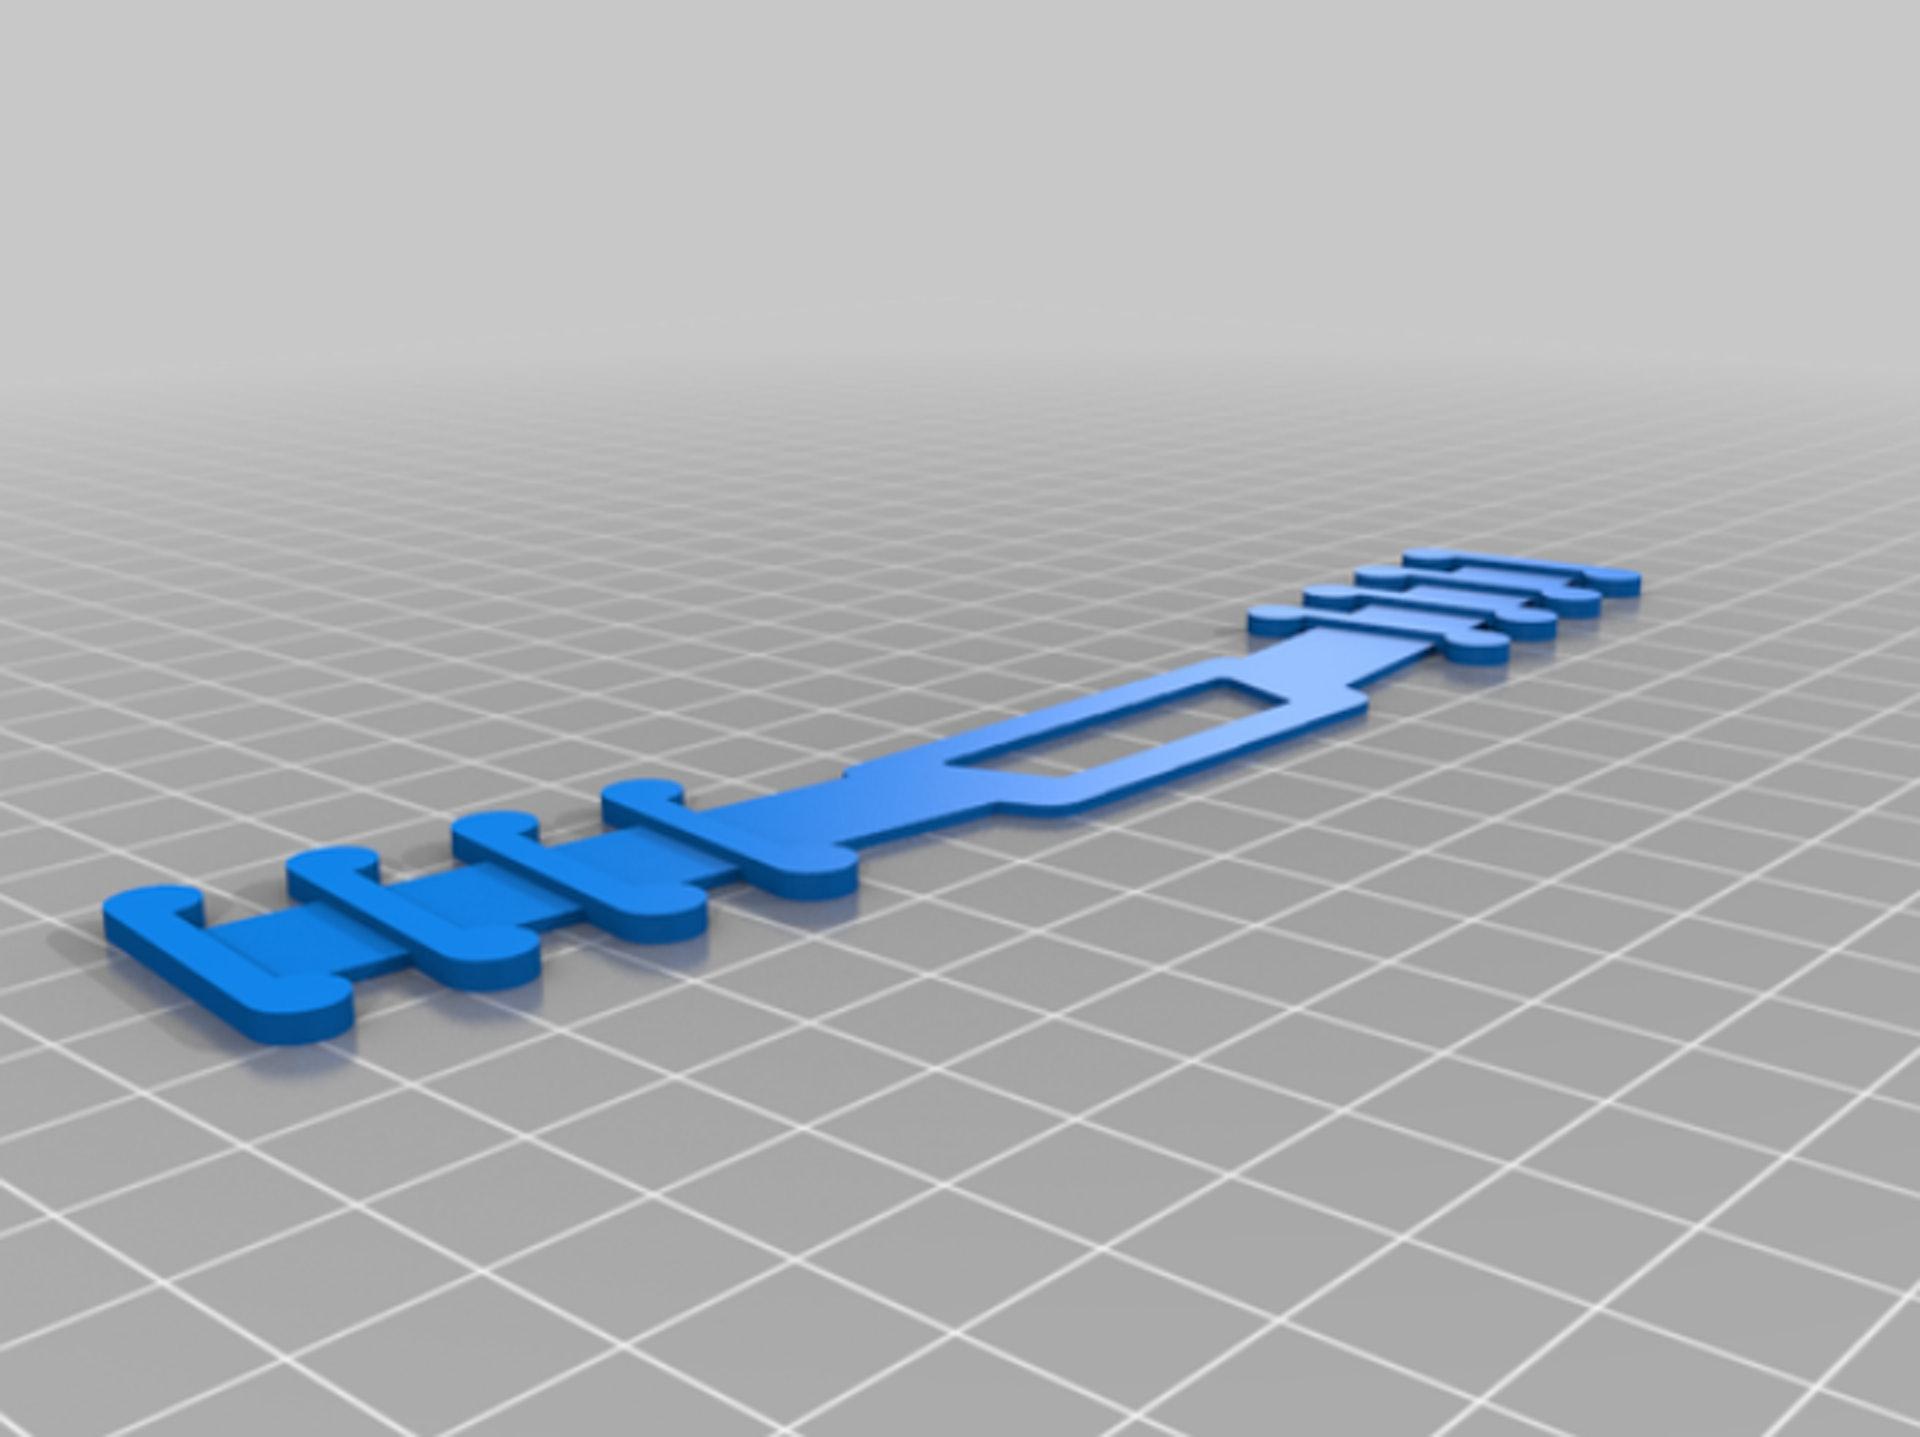 Quinn大方分享設計圖,呼籲有3D打印機的人一同製作膠條供有需要醫護使用。(thingiverse網頁圖片)